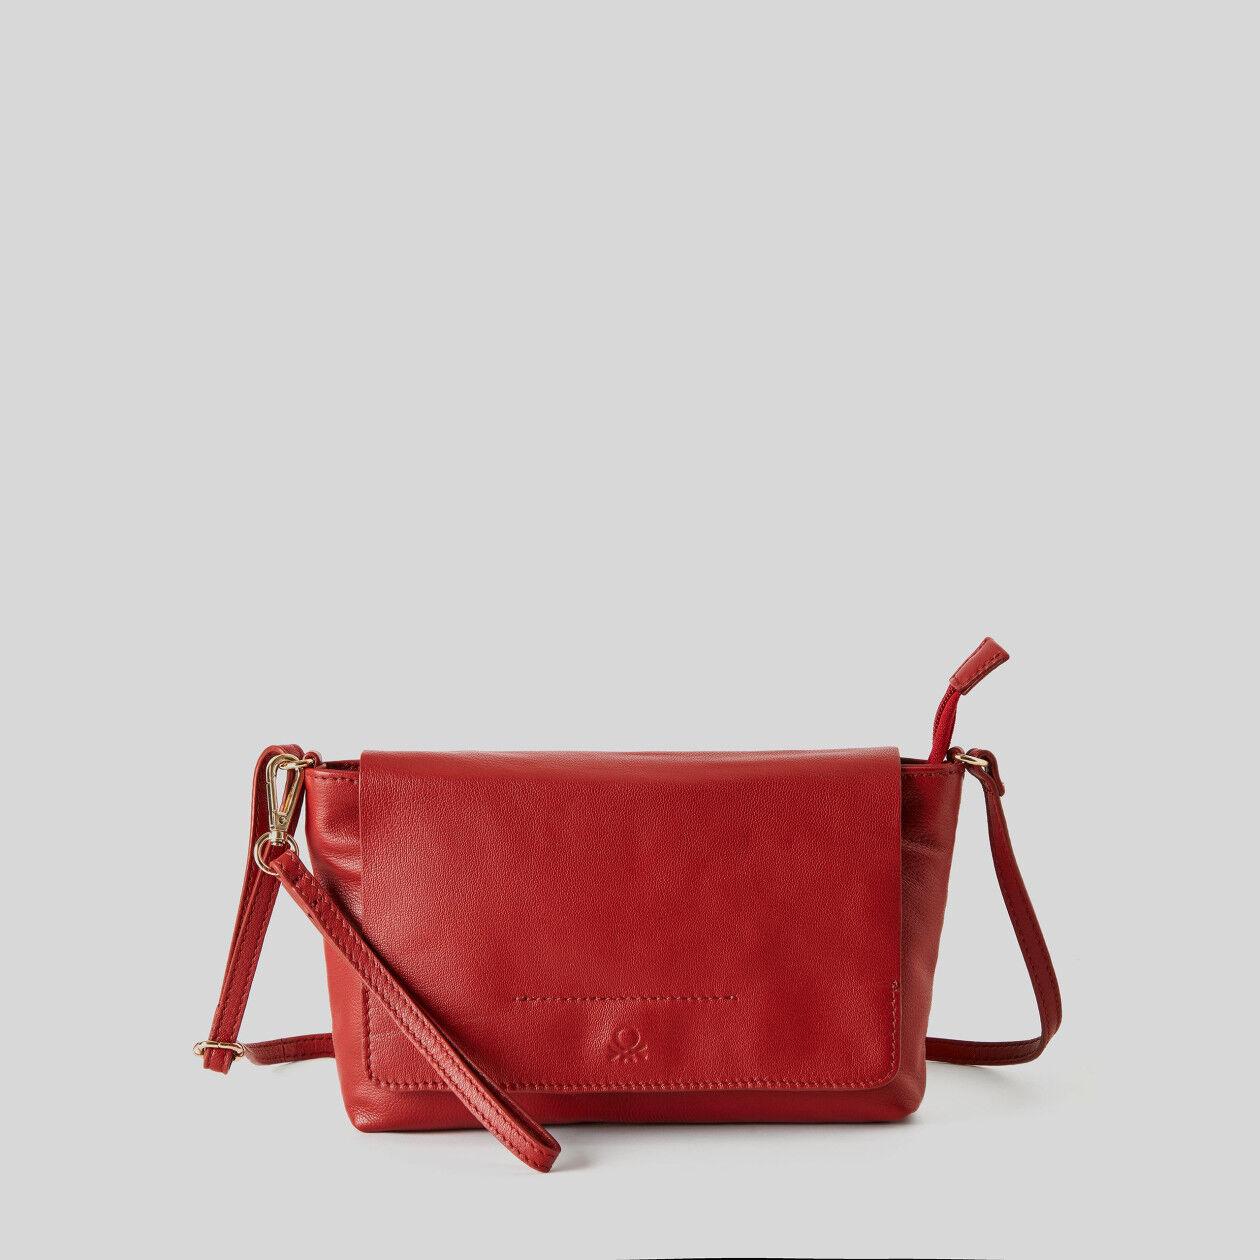 Crossbody and clutch bag